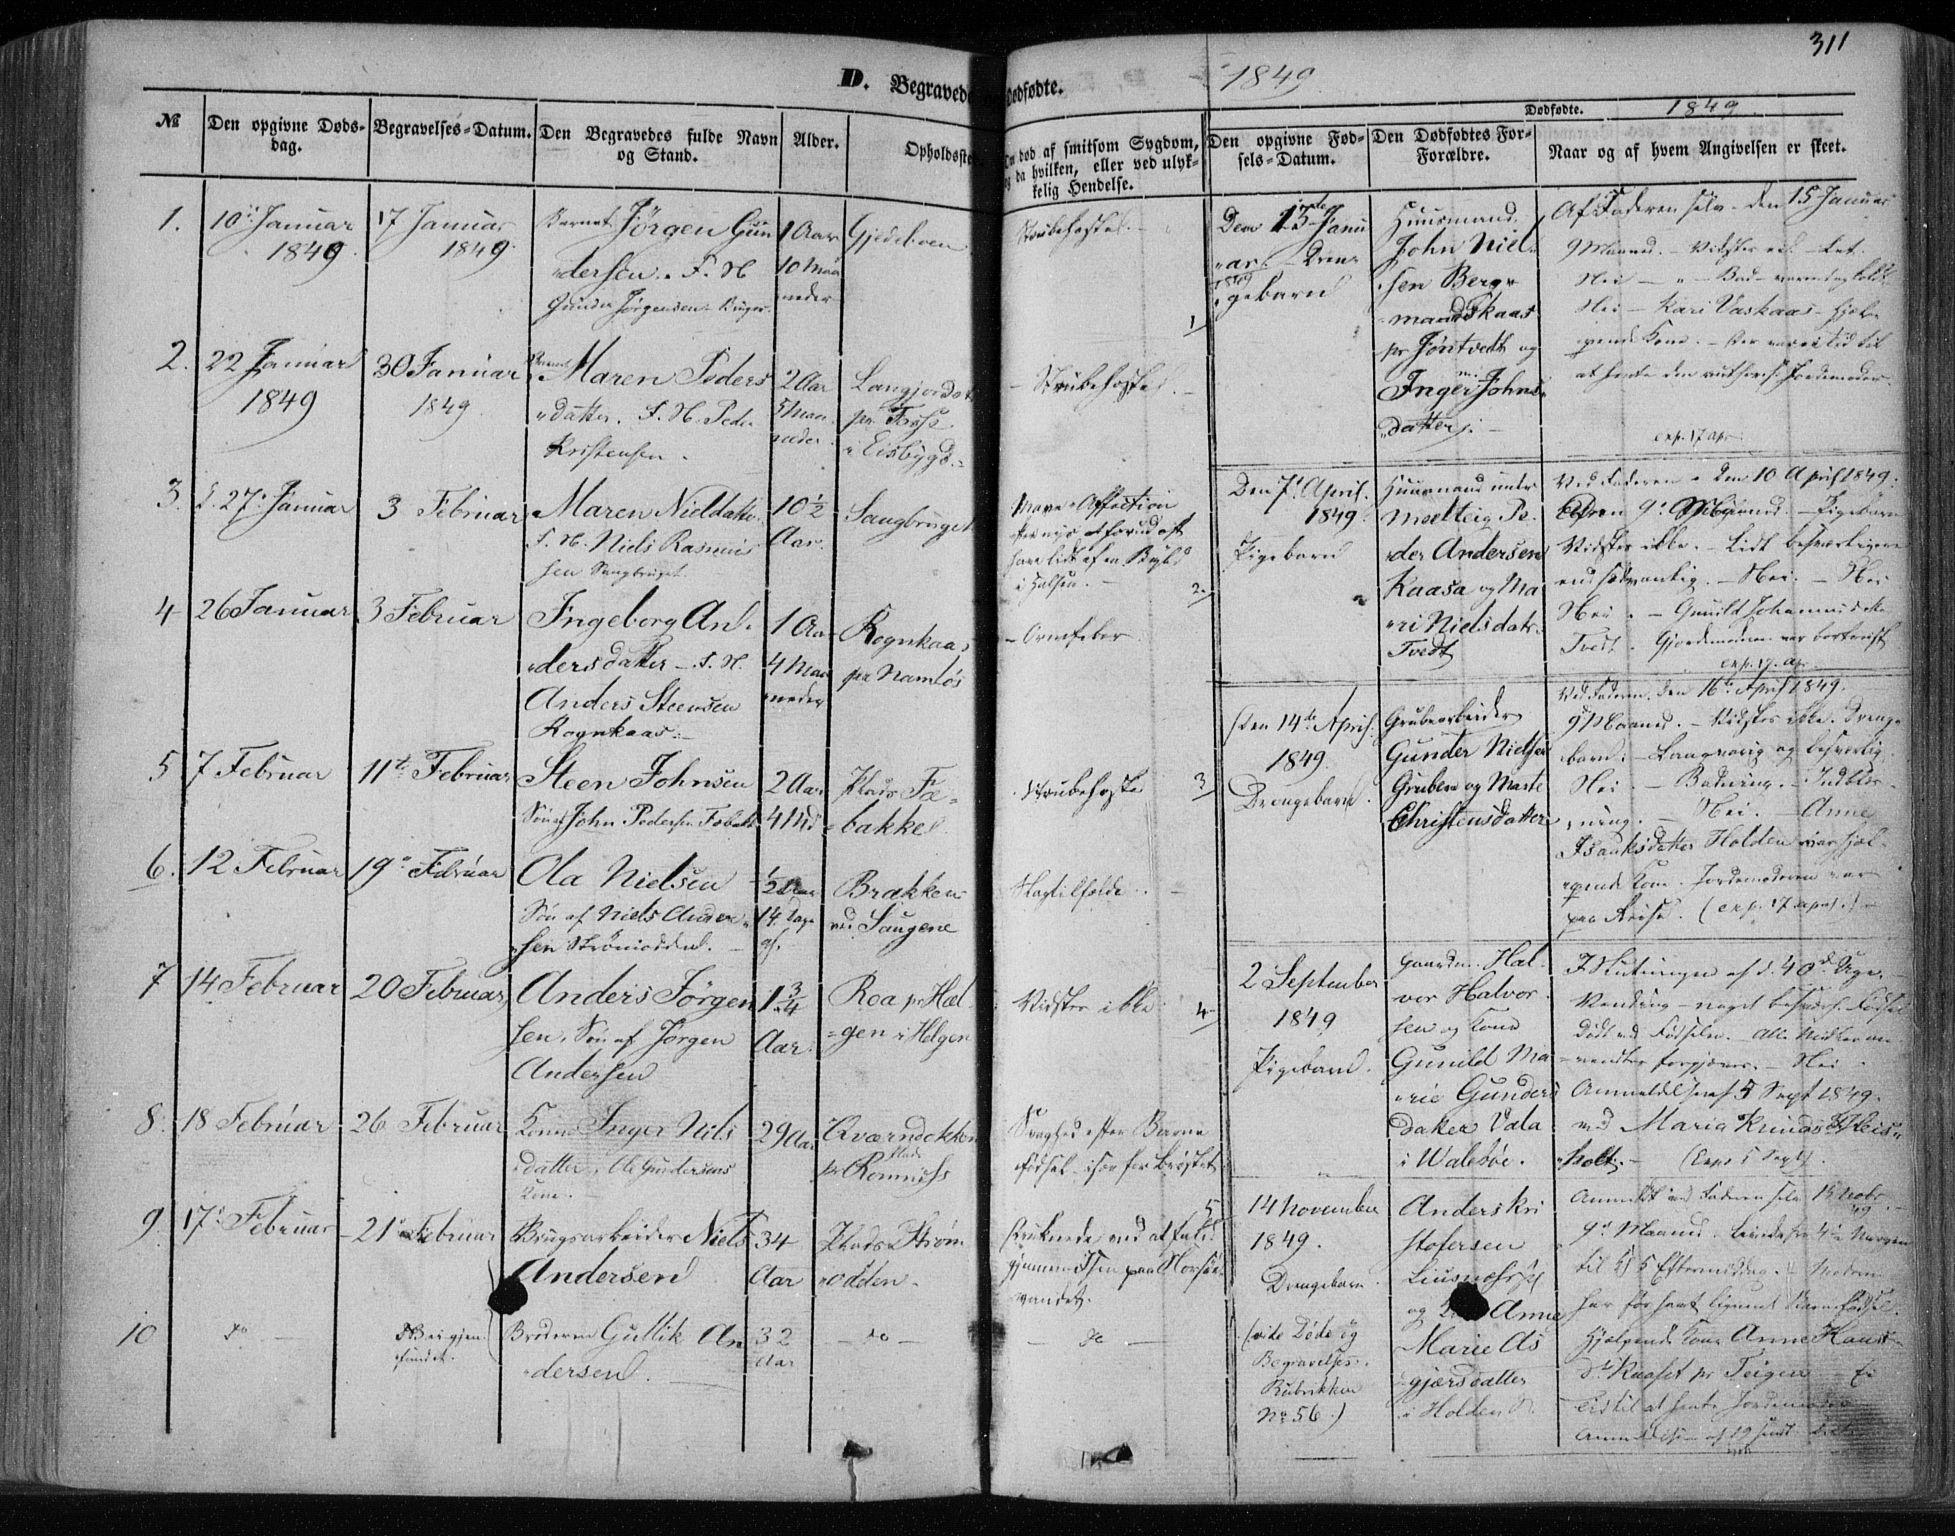 SAKO, Holla kirkebøker, F/Fa/L0005: Ministerialbok nr. 5, 1849-1860, s. 311